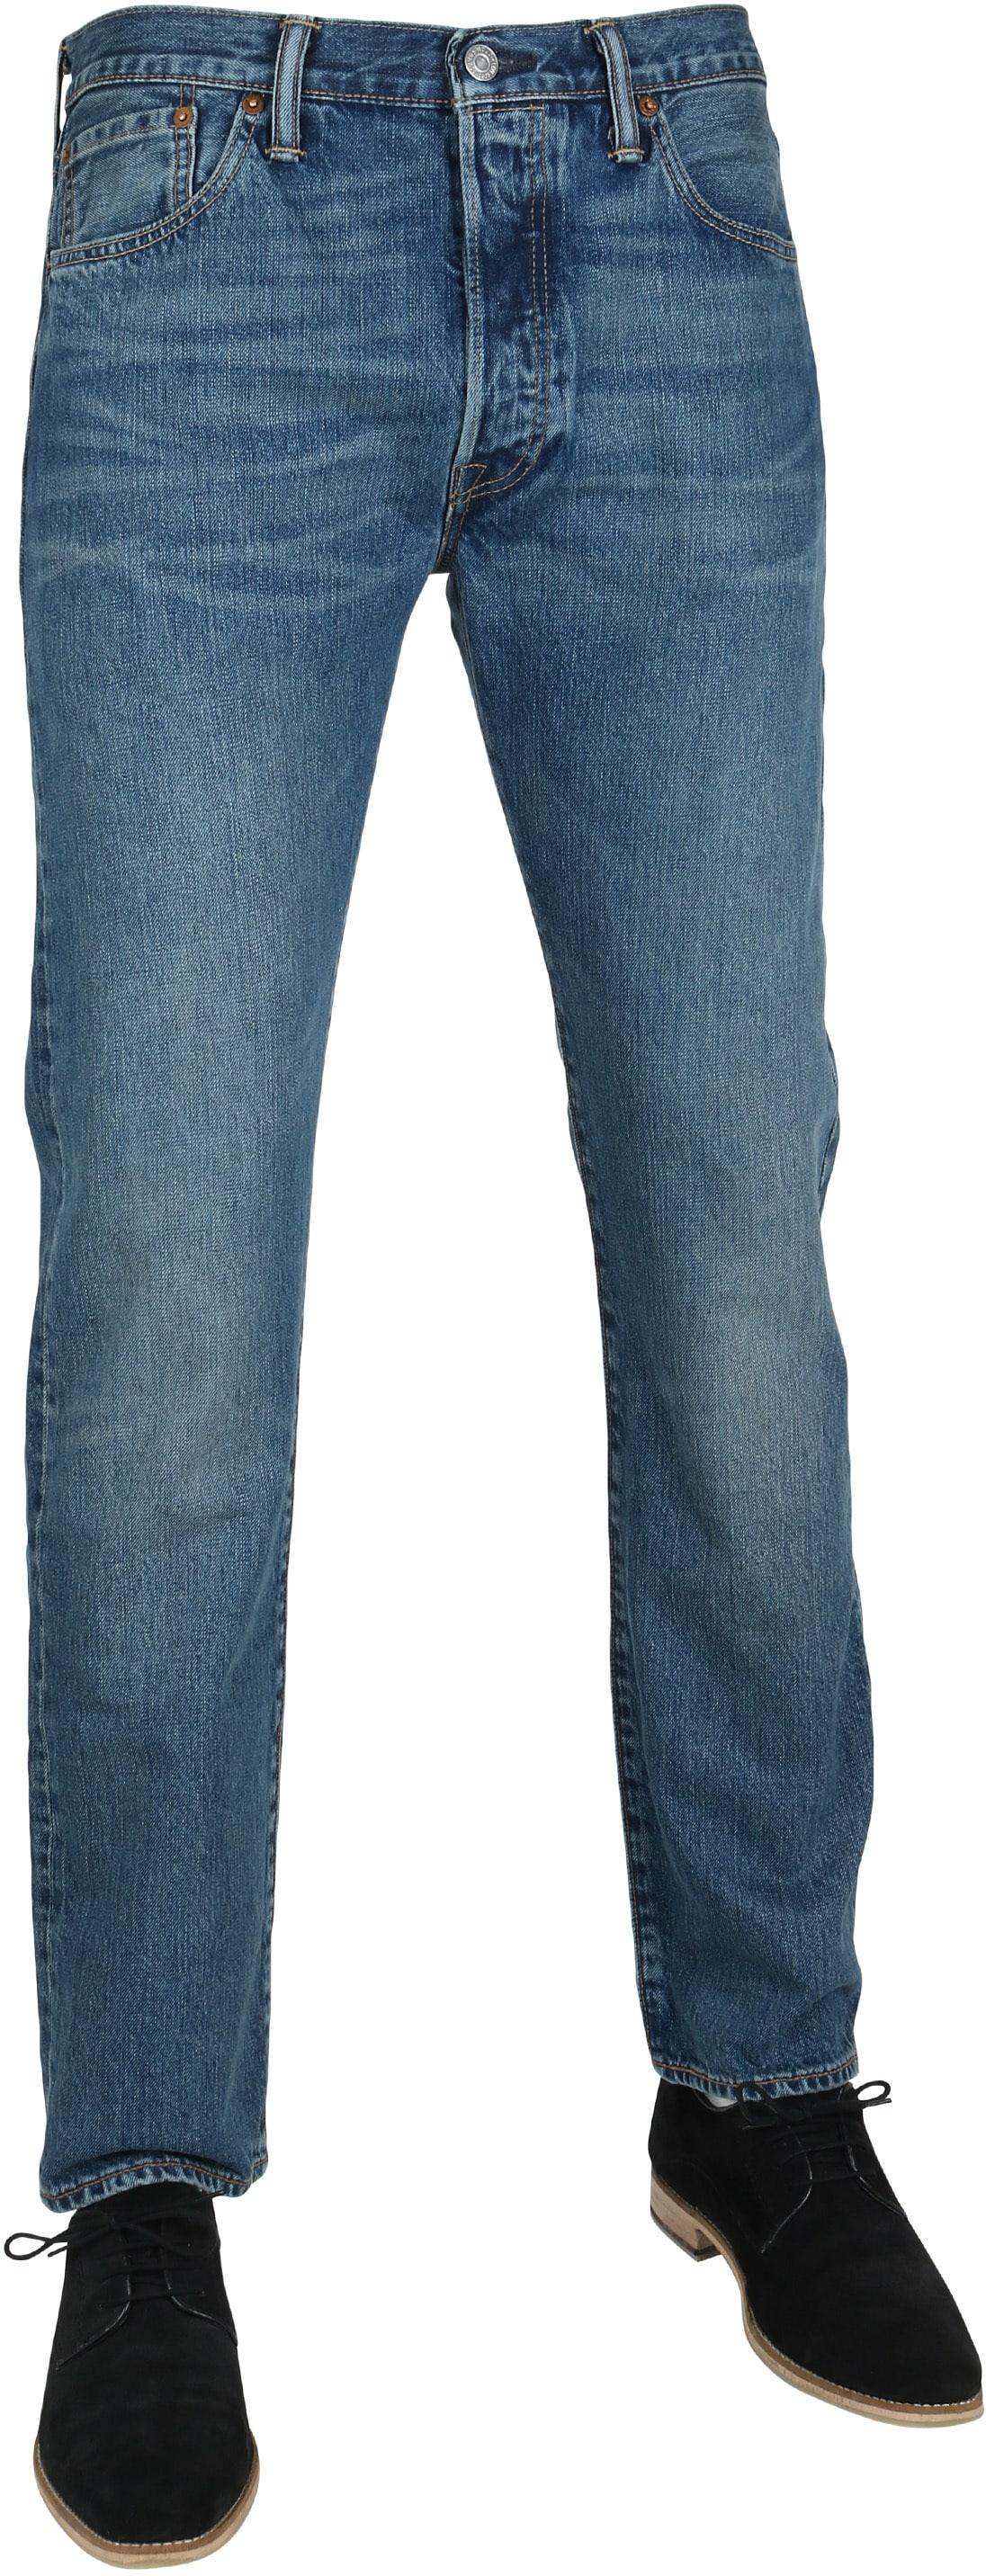 Levi's Jeans 501 Original 1307 Hook foto 0